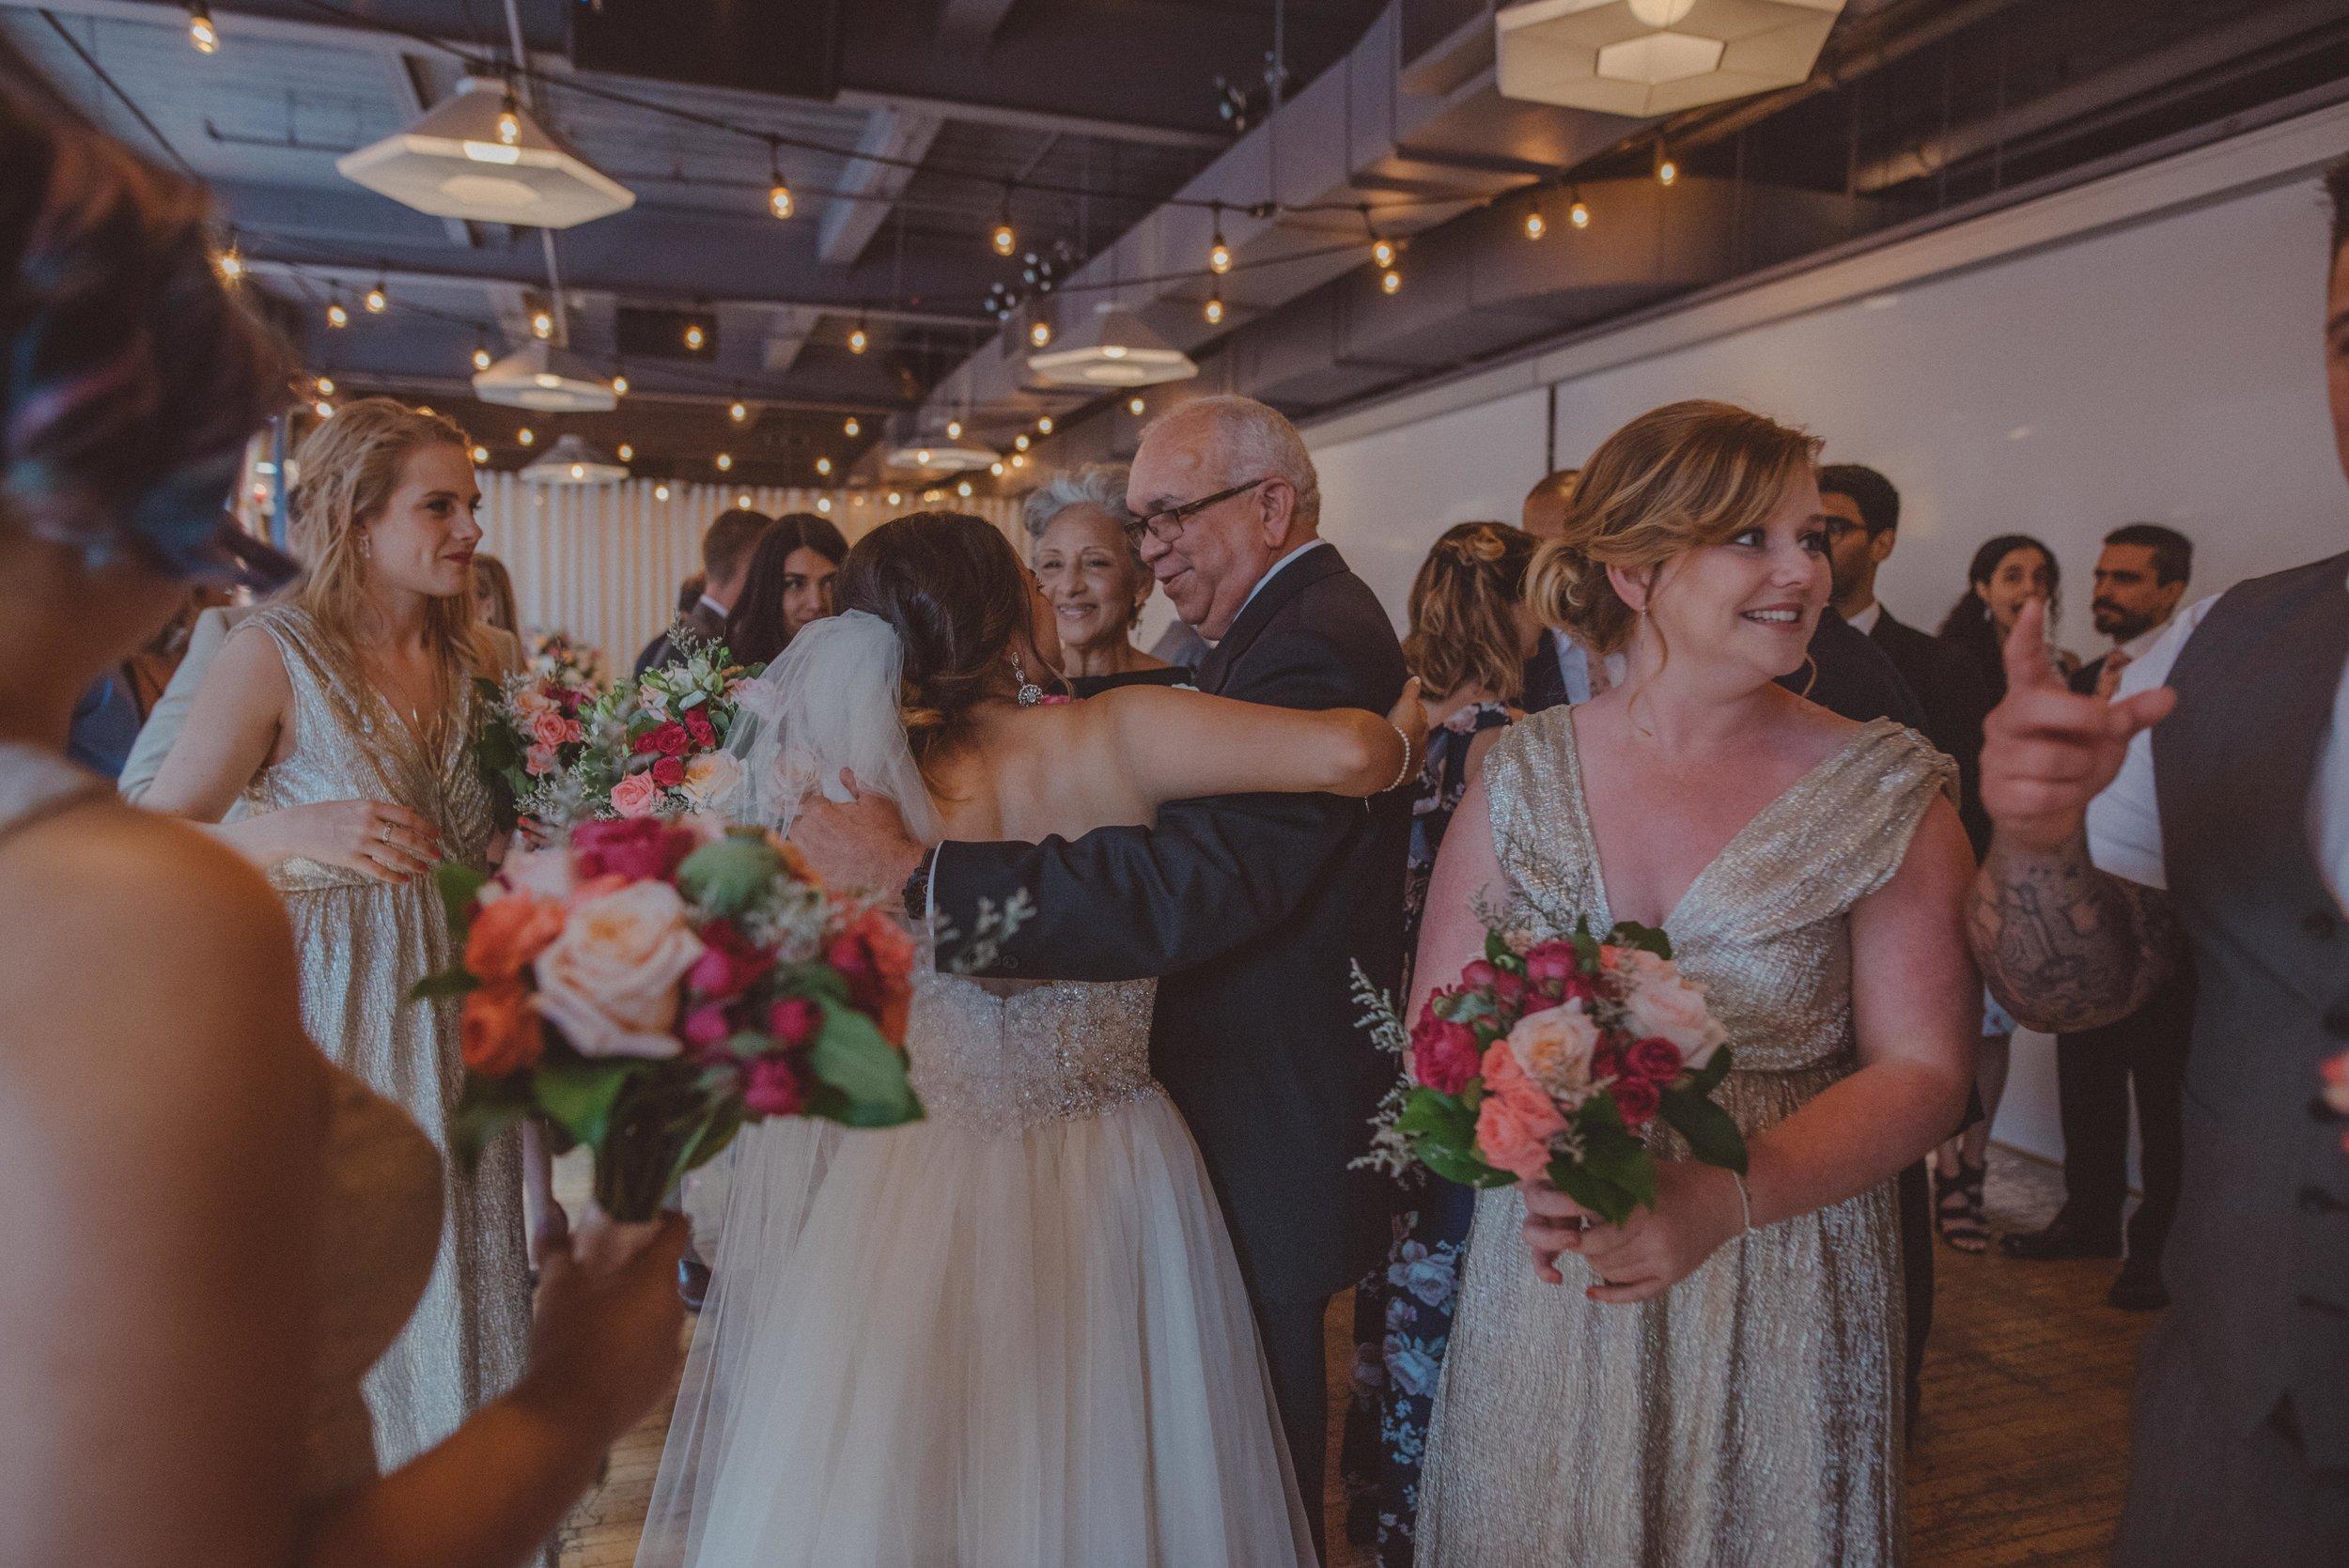 mariage_photographe_toronto_gatineau_ottawa_photographer_wedding-33.jpg